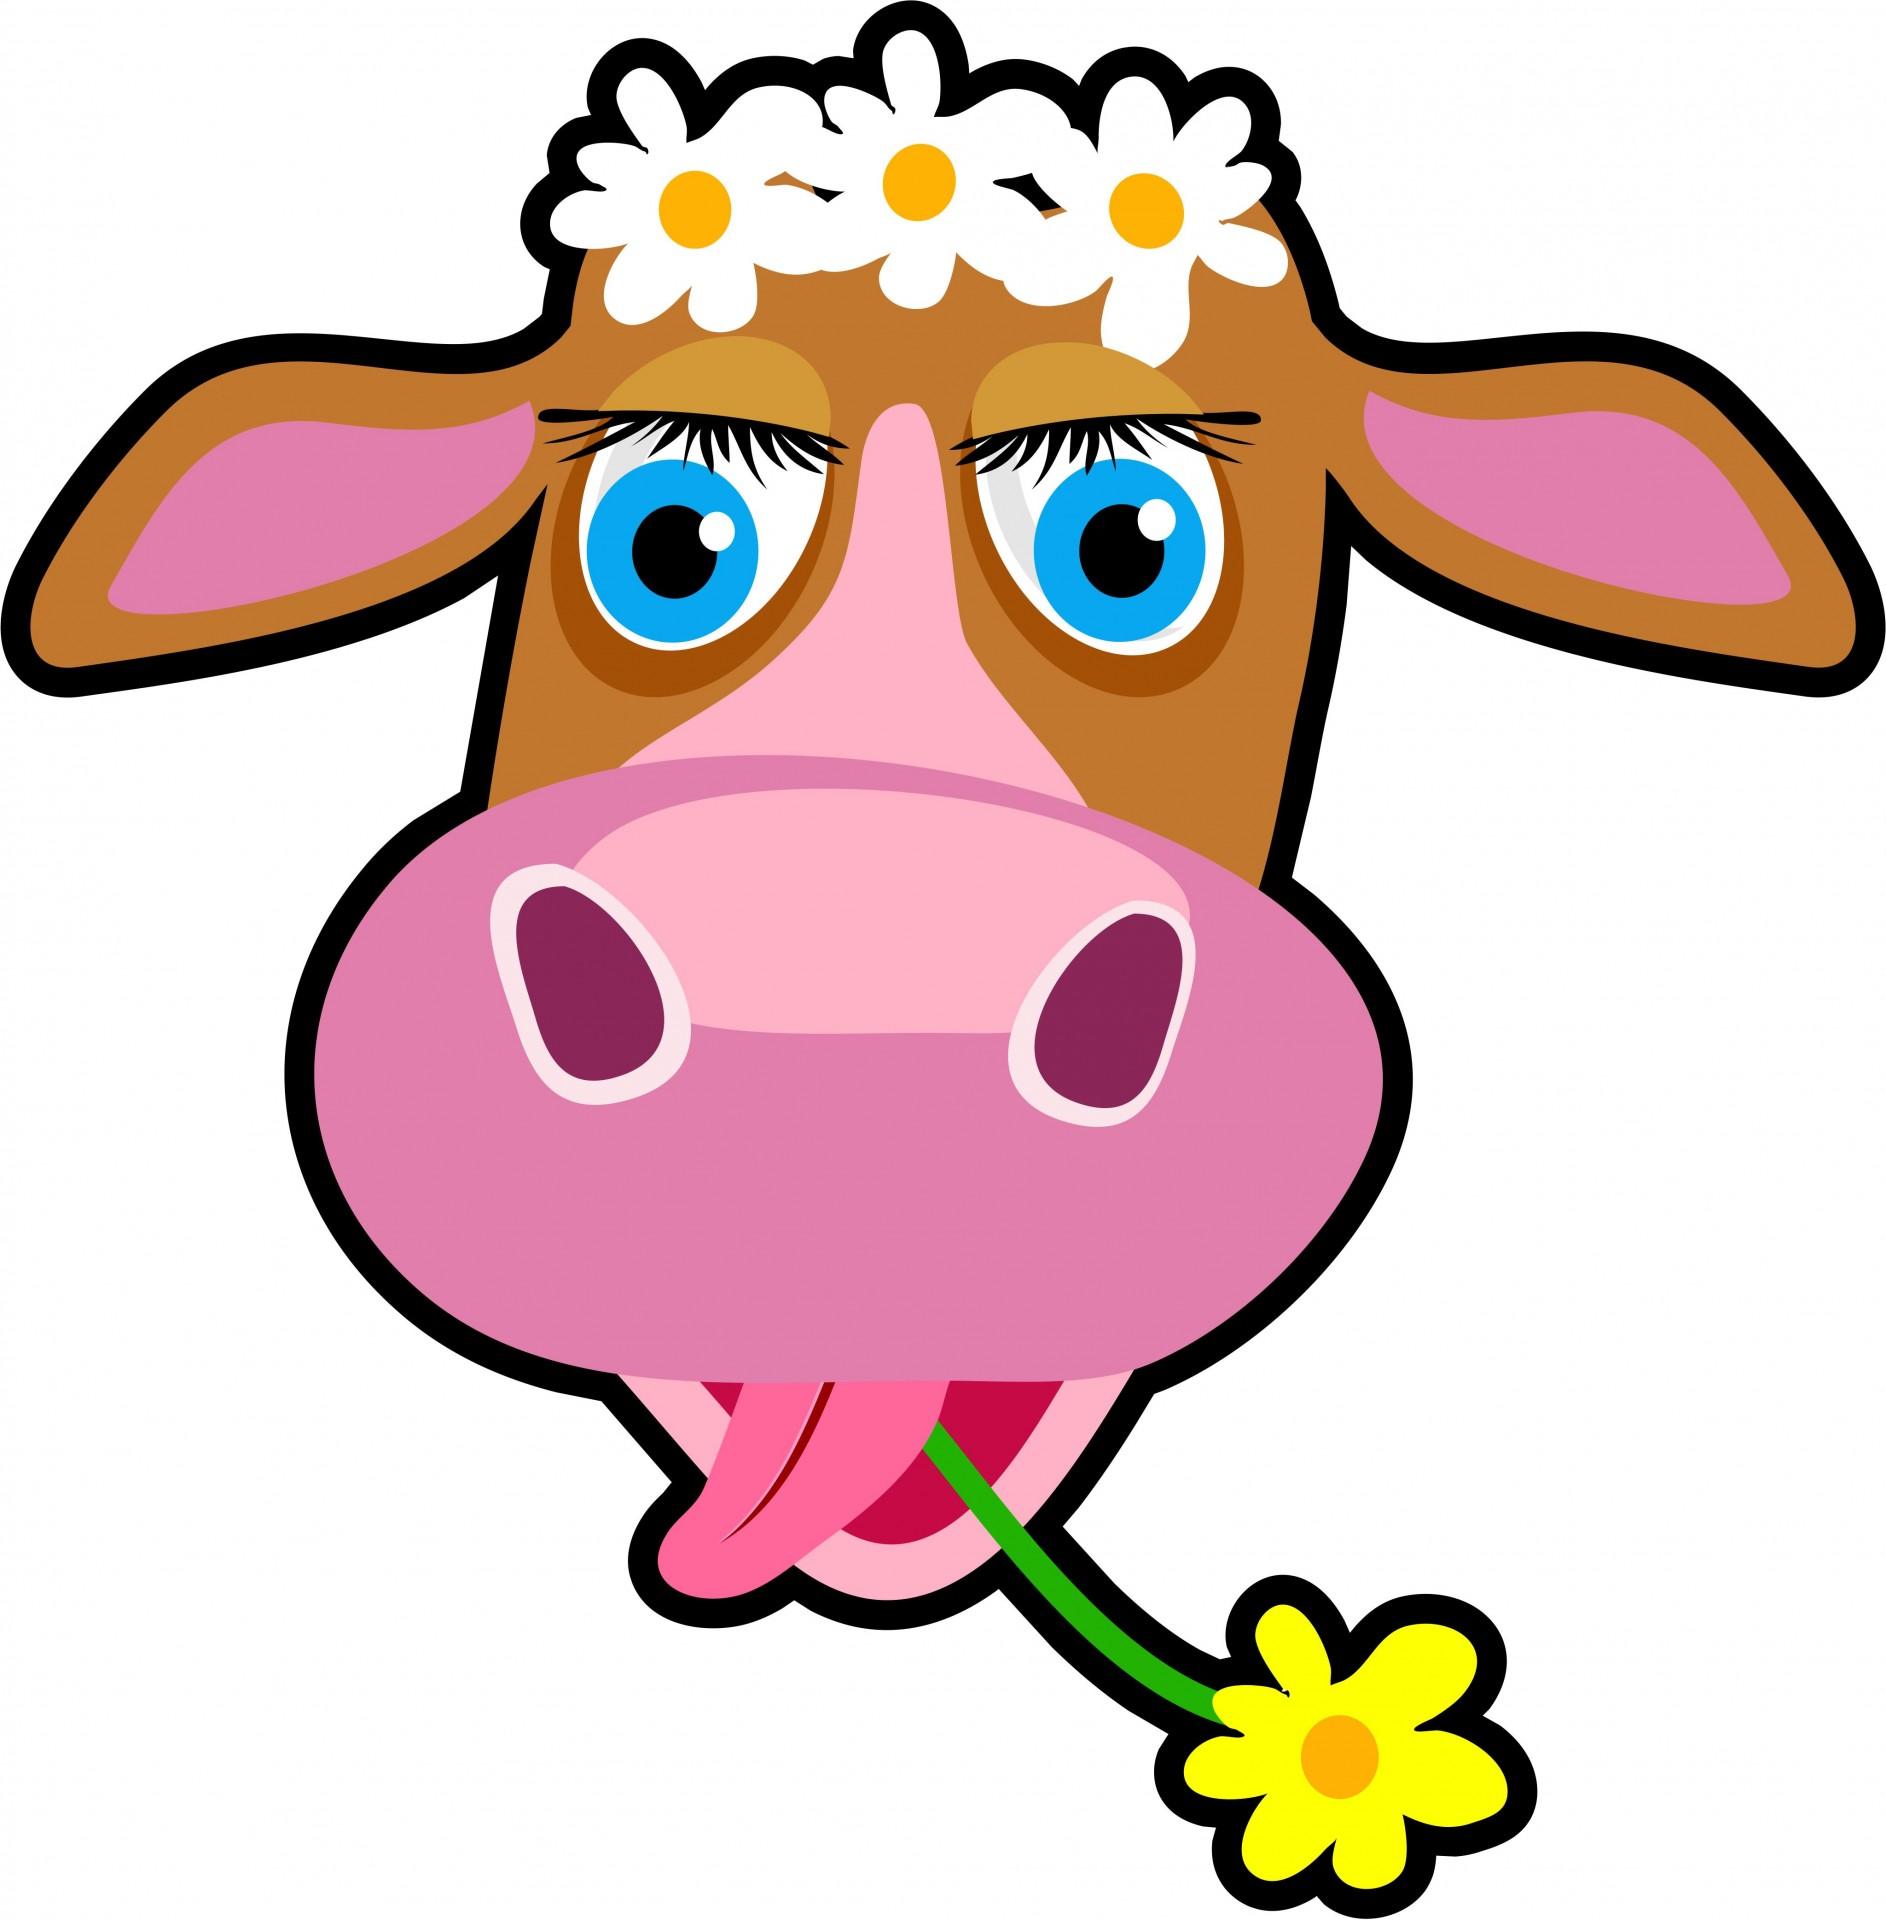 1886x1920 Cartoon Cow Clipart Free Stock Photo